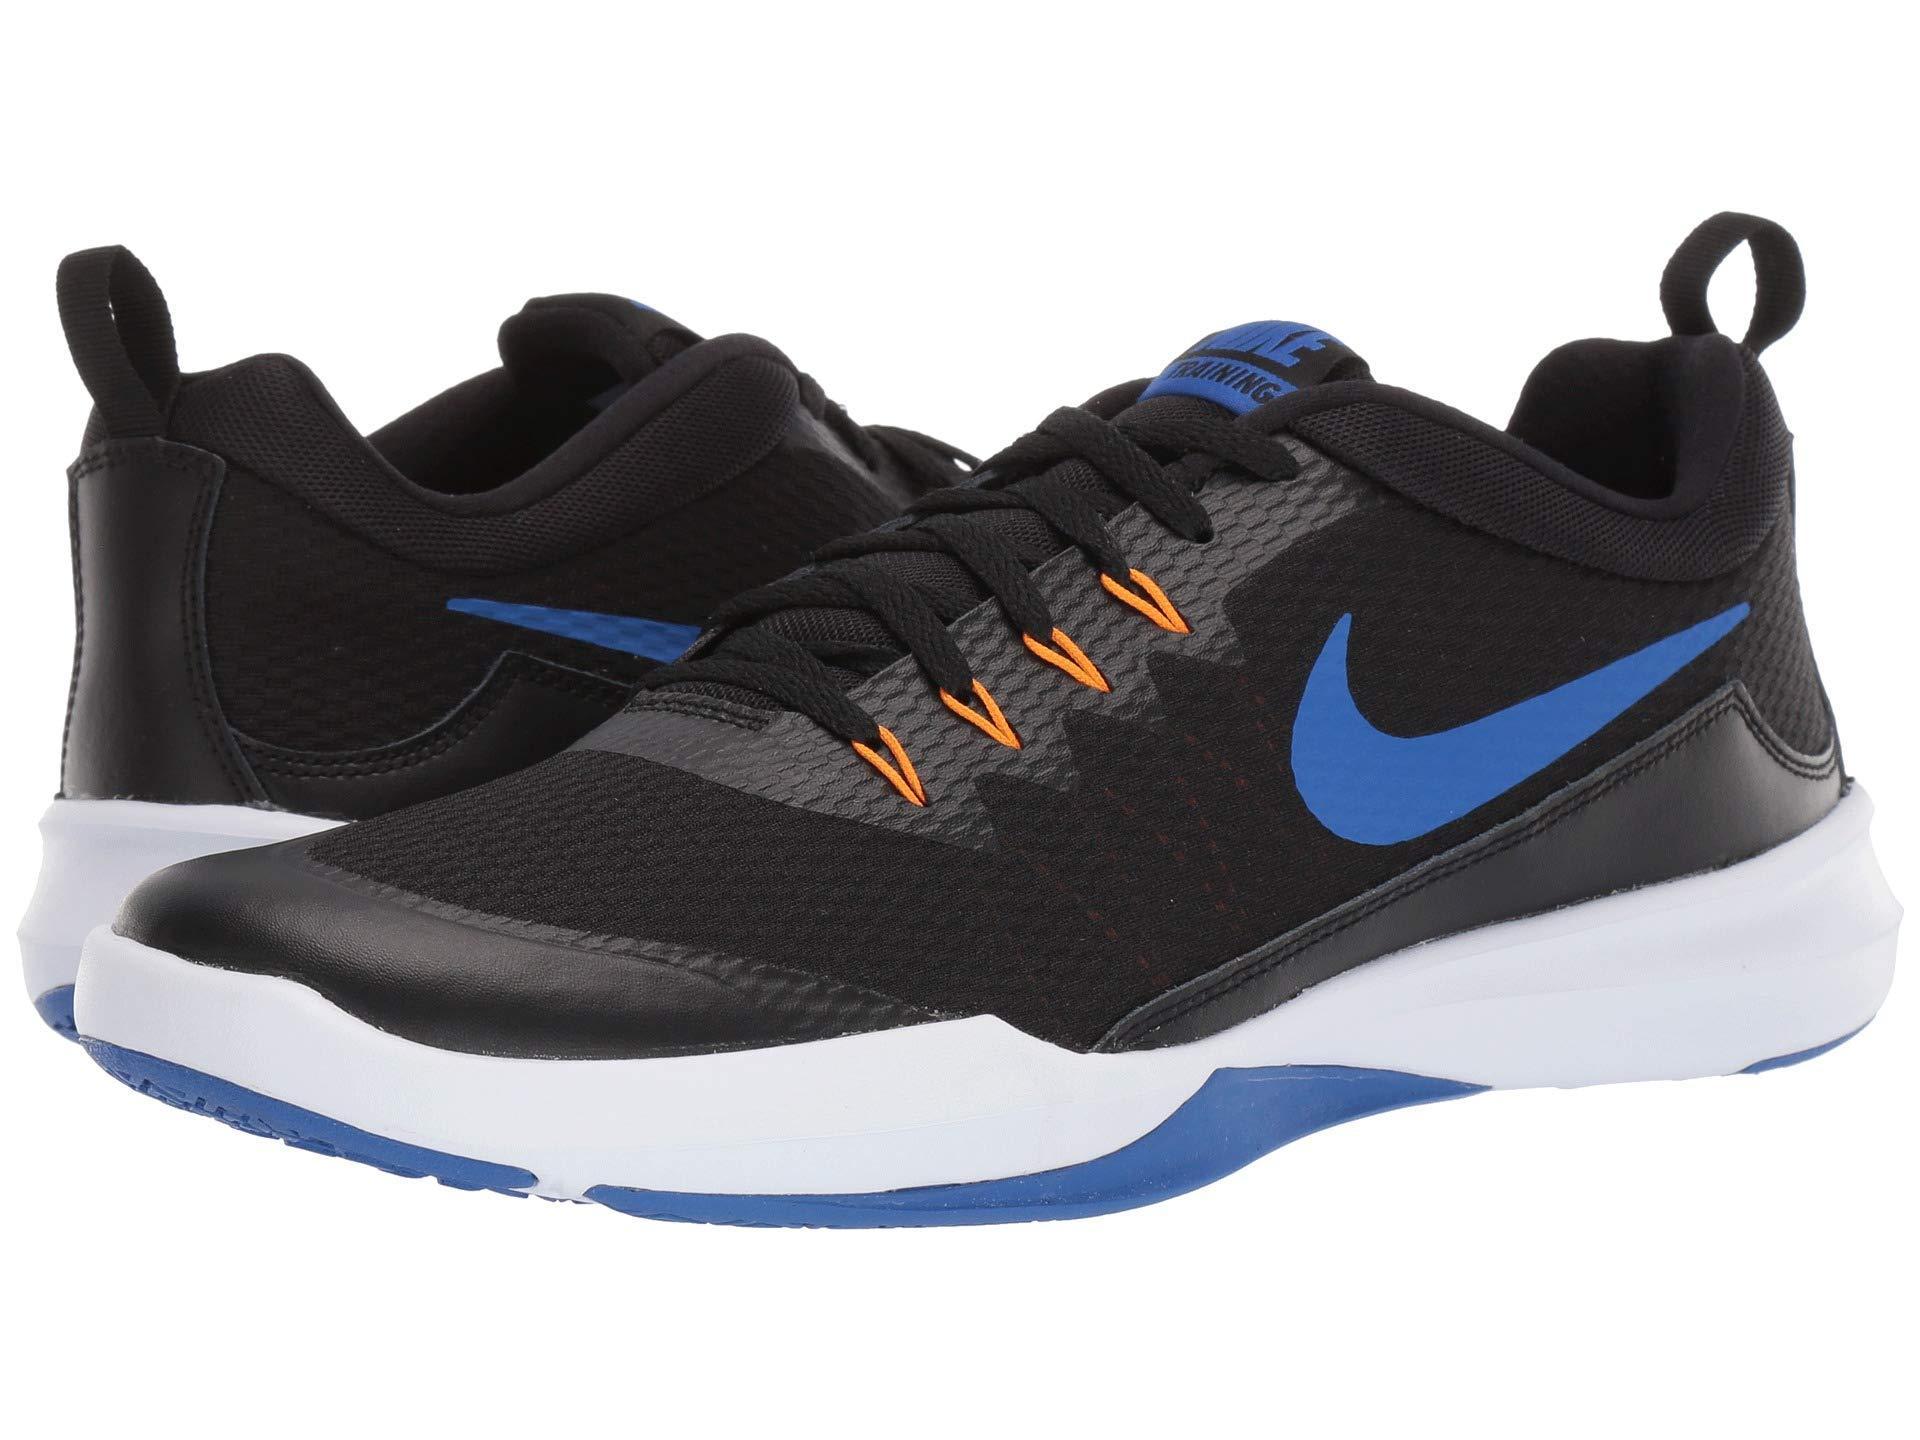 buy popular 6601b 65628 Nike - Legend Trainer (black/metallic Silver/white) Men's Cross Training  Shoes. View fullscreen